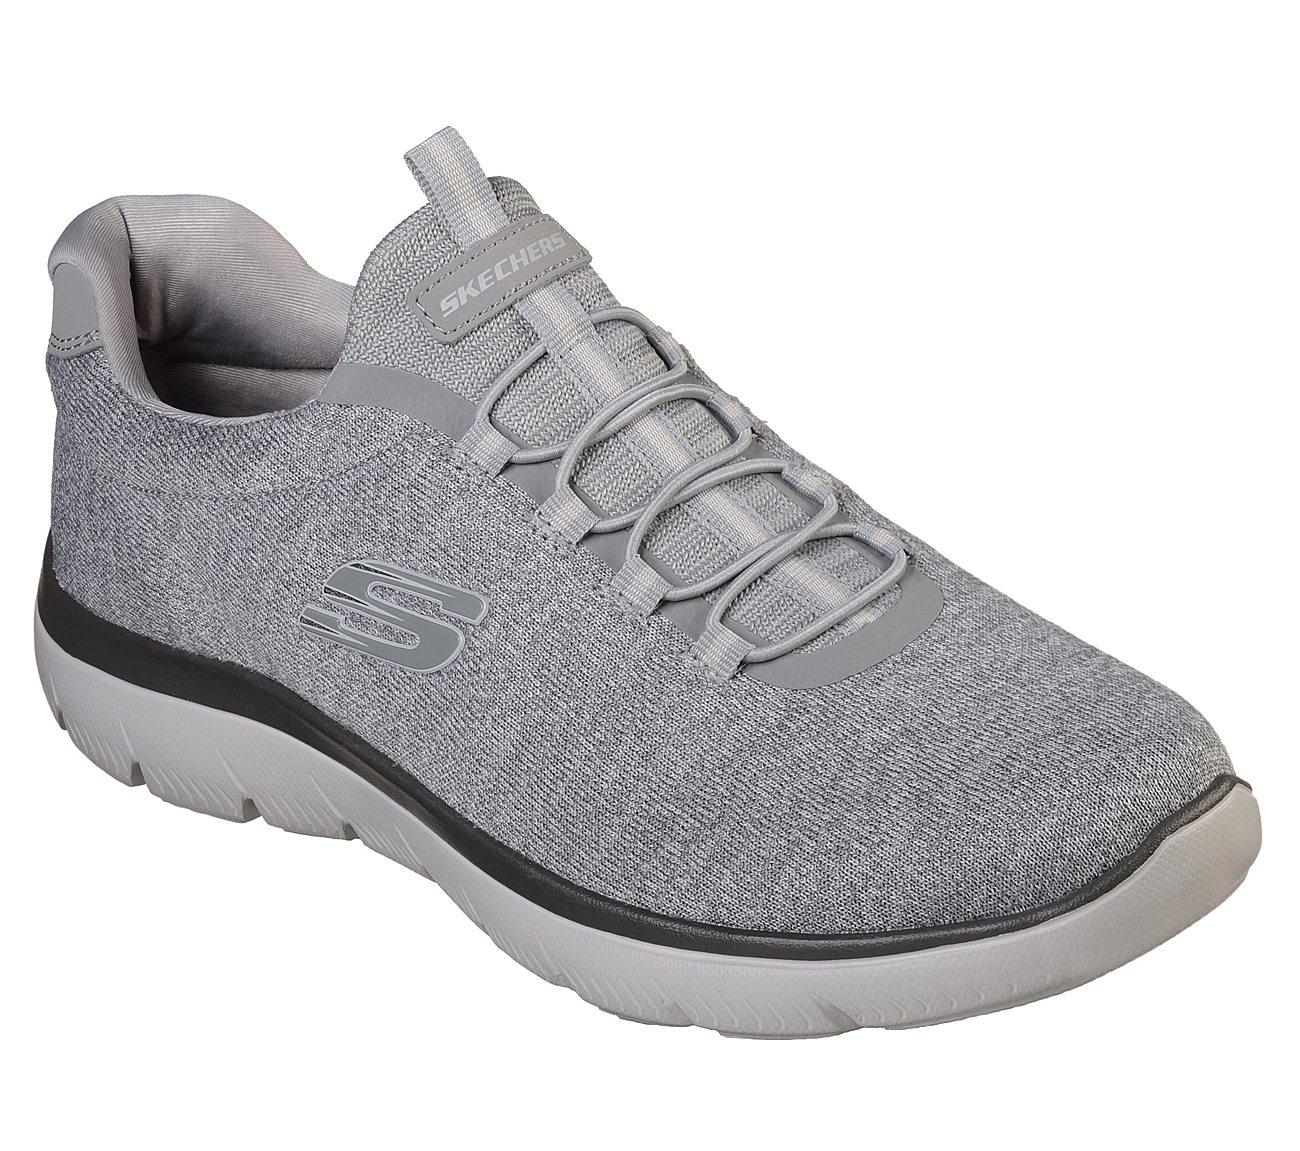 Buy SKECHERS Summits Forton Sport Shoes Nwhz8